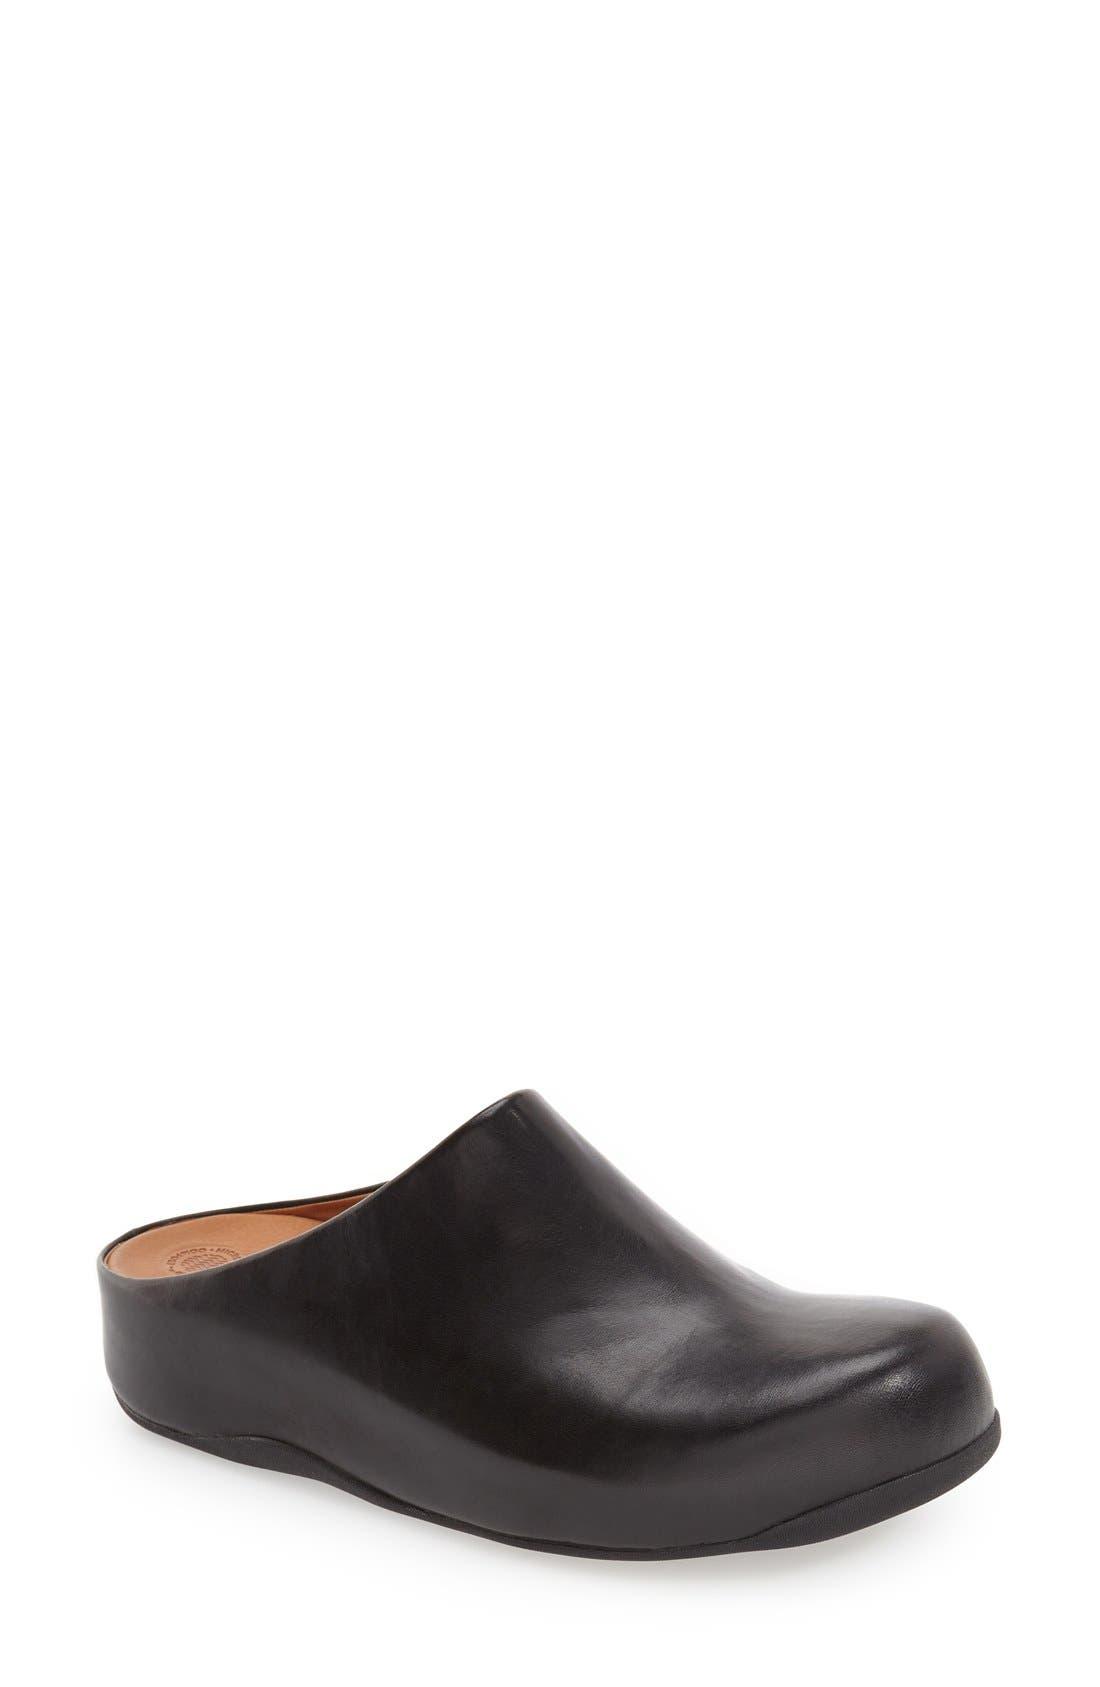 'Shuv(TM)' Leather Clog